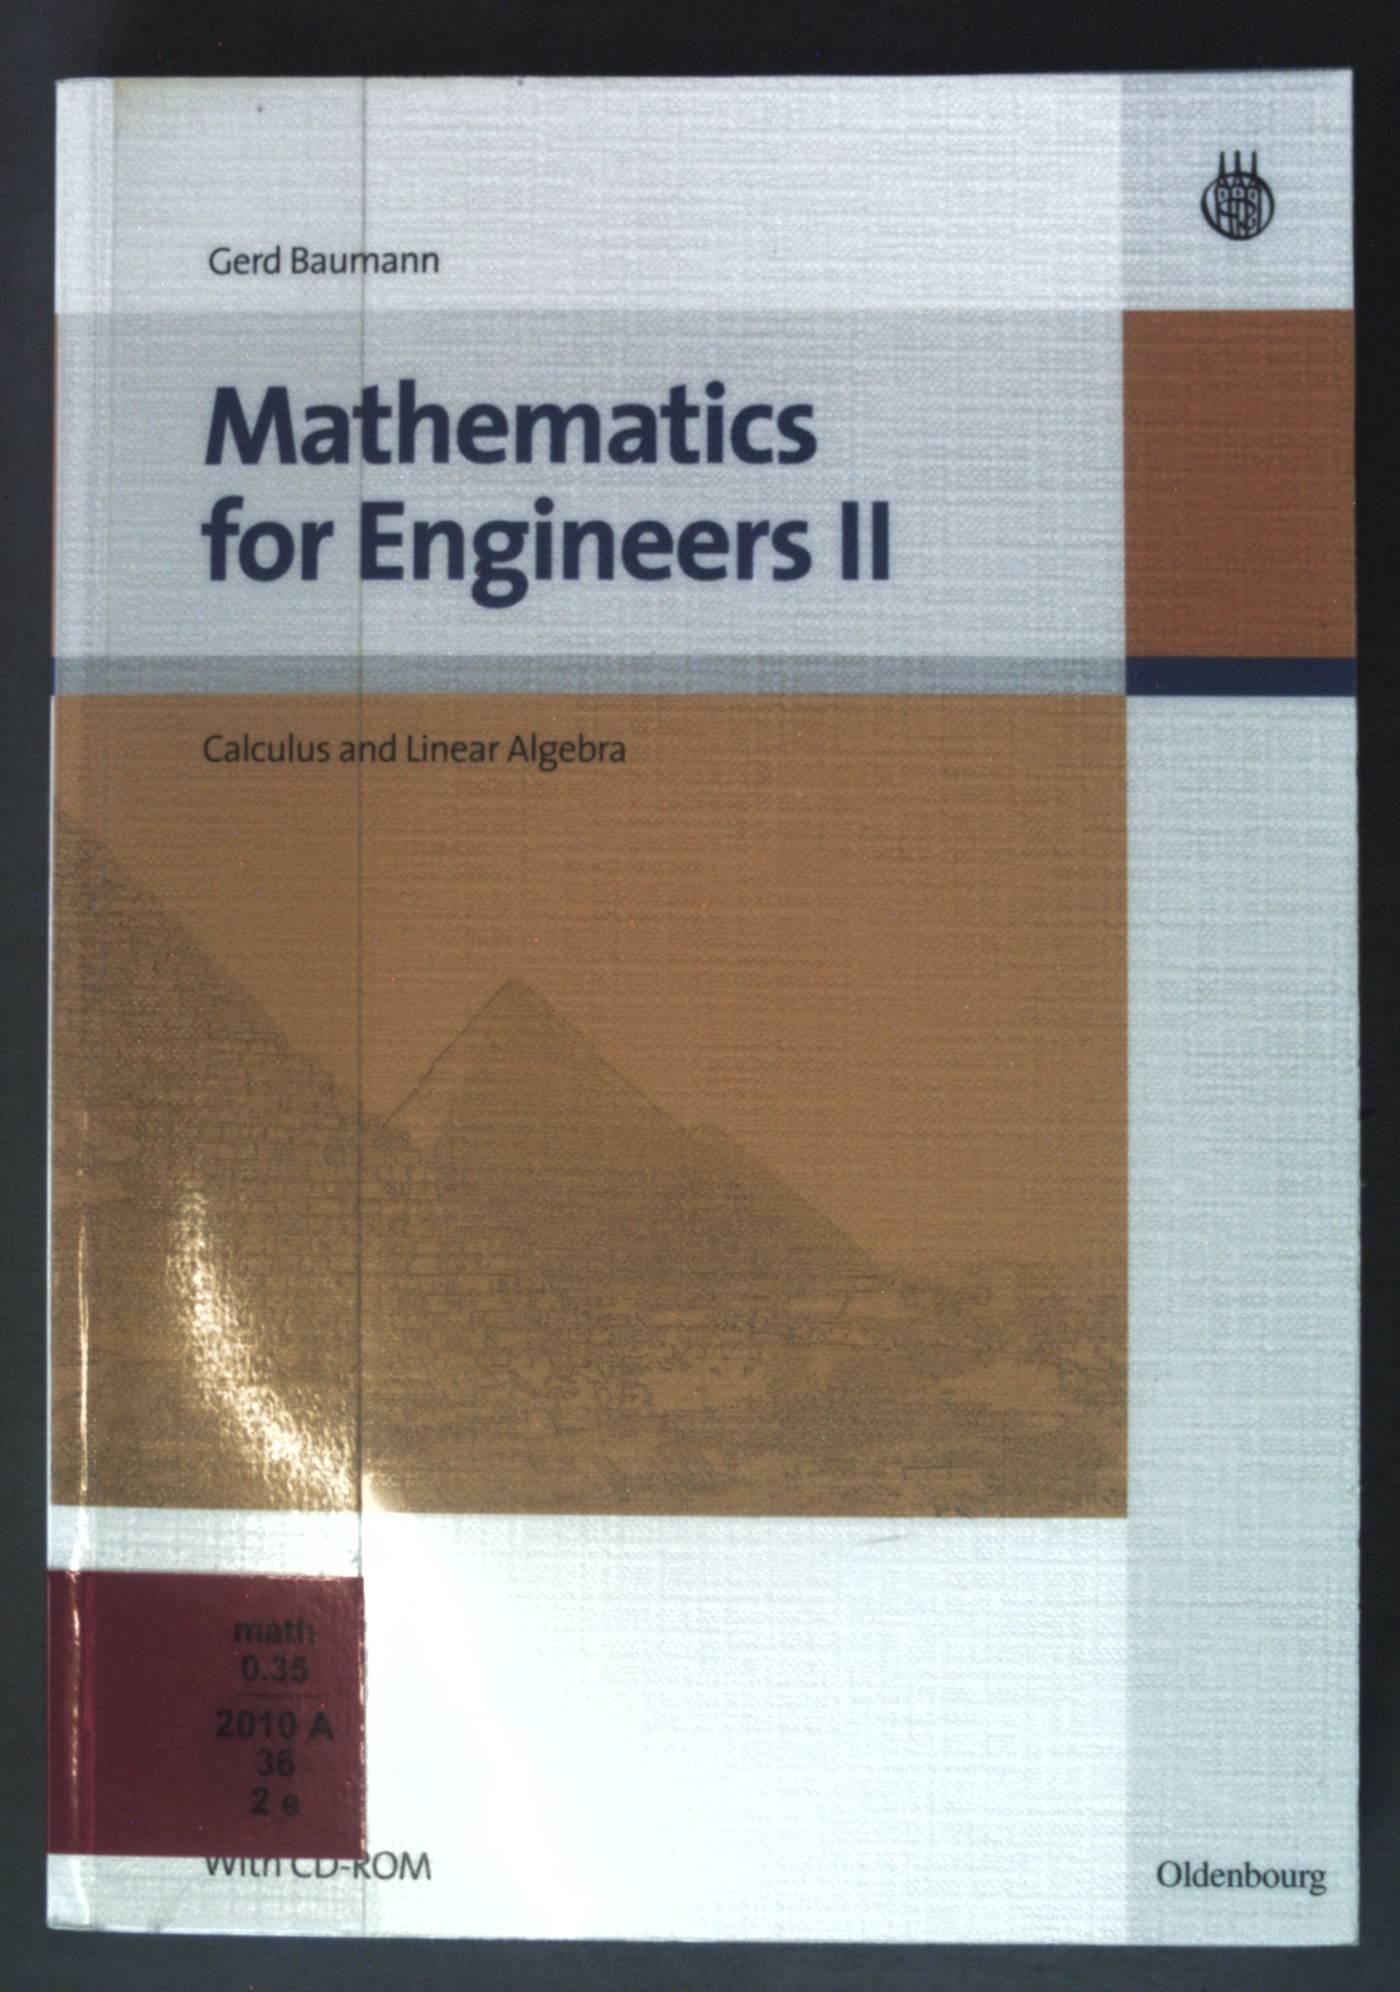 Mathematics for Engineers II: Calculus and Linear: Baumann, Gerd: